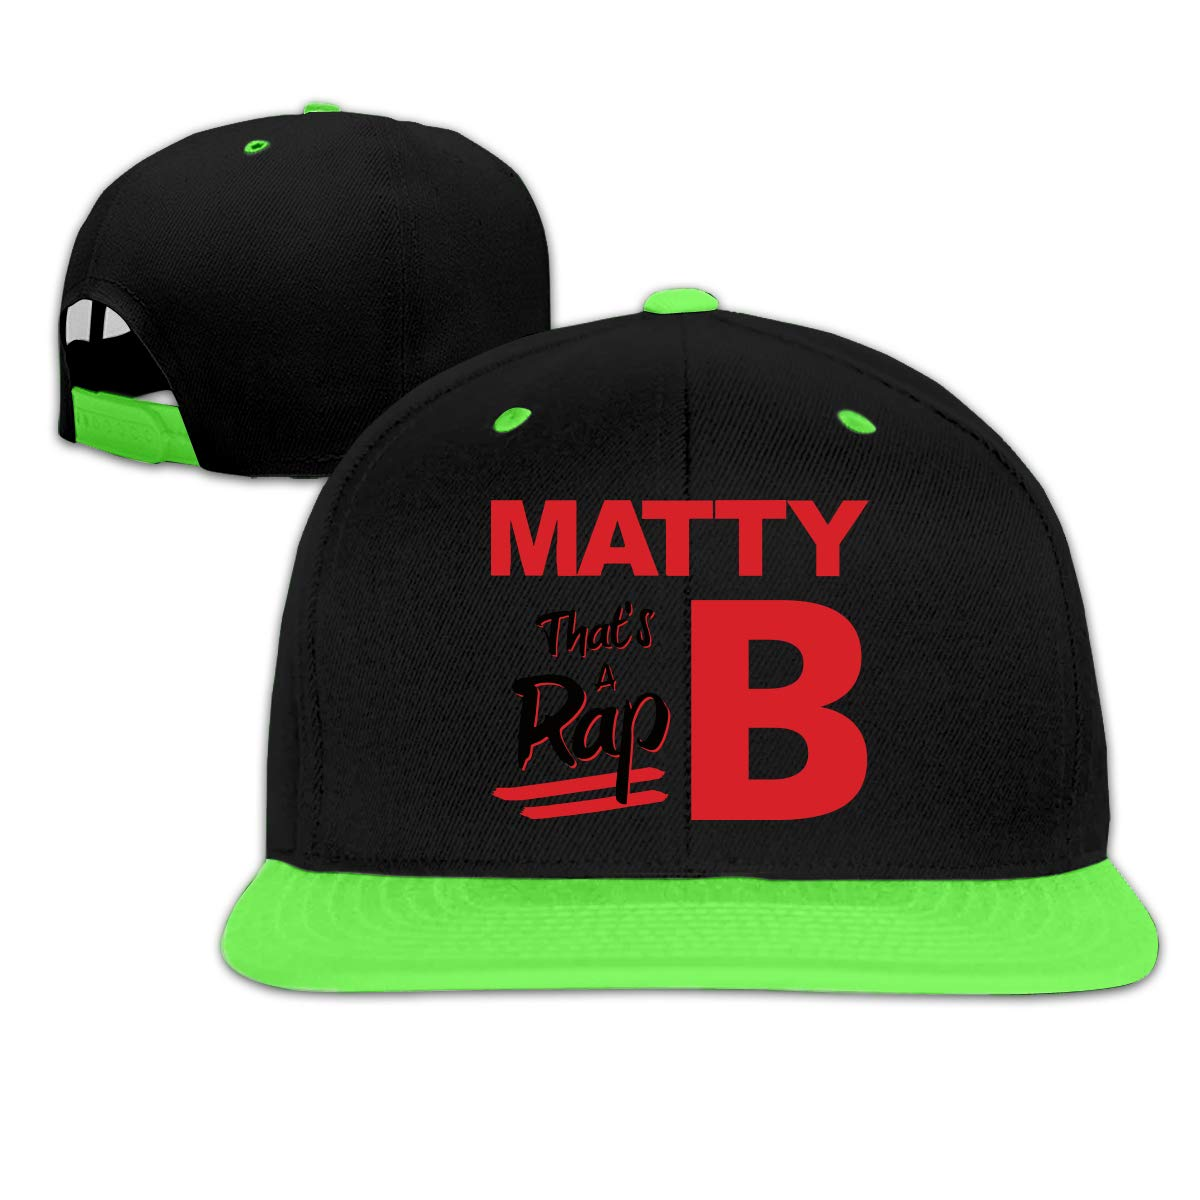 Dunpaiaa Custom Mattyb Rap Kids Girl Boy Hip Hop Baseball Cap Adjustable Snapback Hat Red